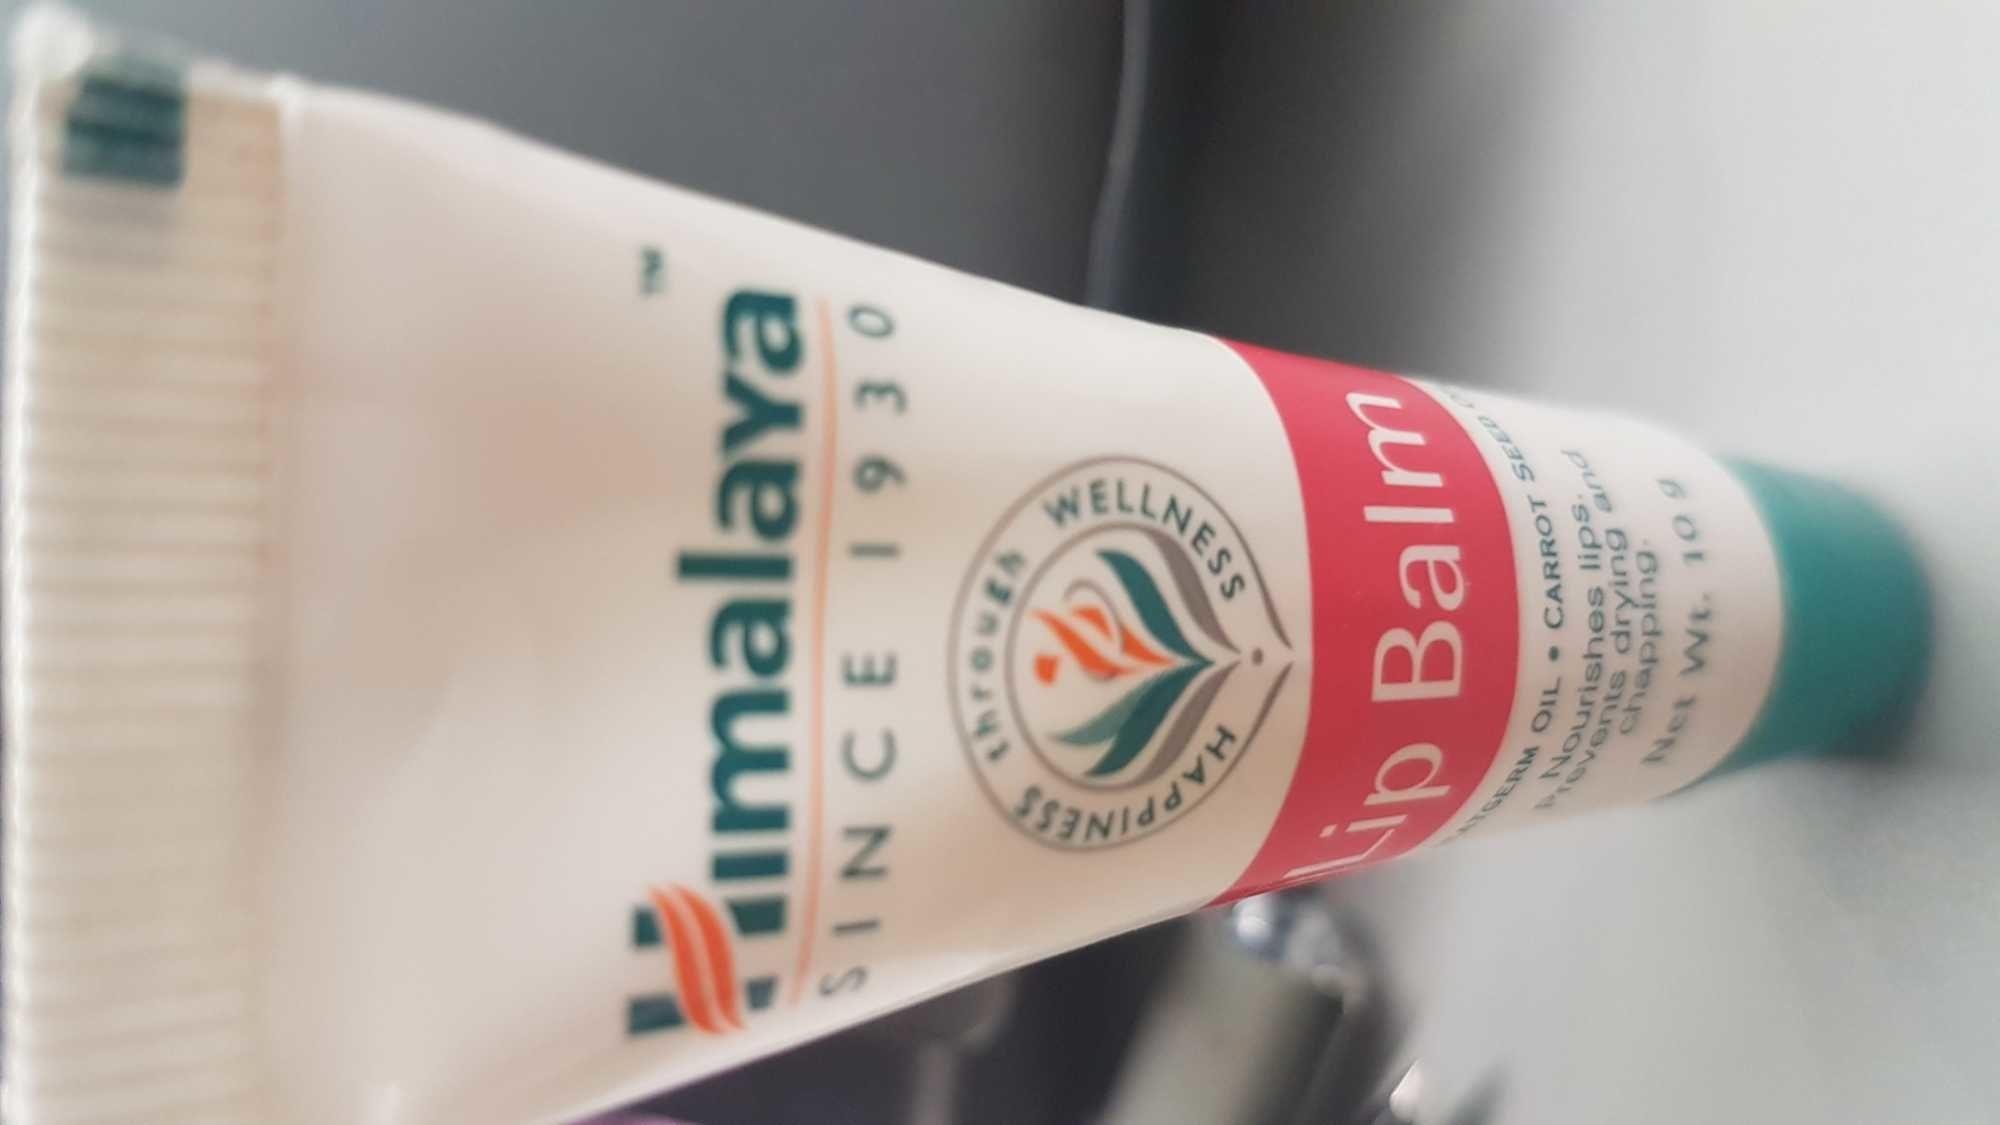 Lip balm - Product - en